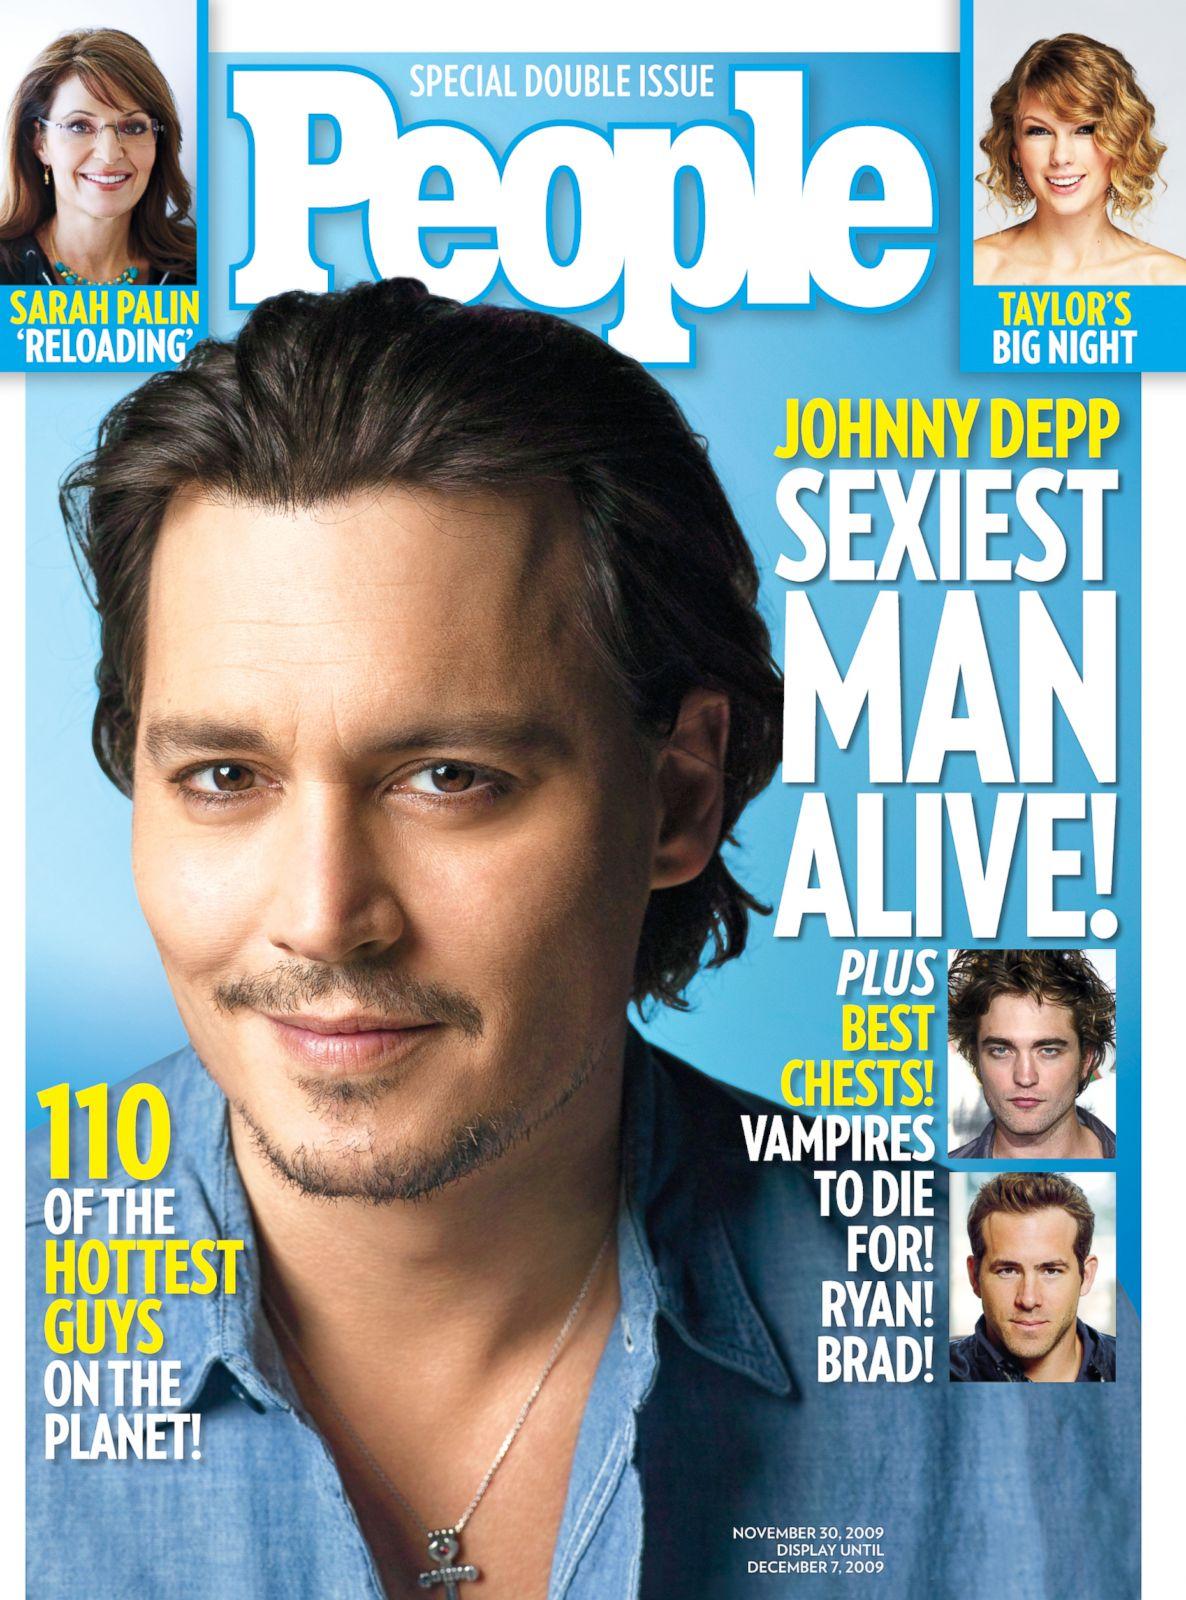 Top 10 sexiest man alive 2012